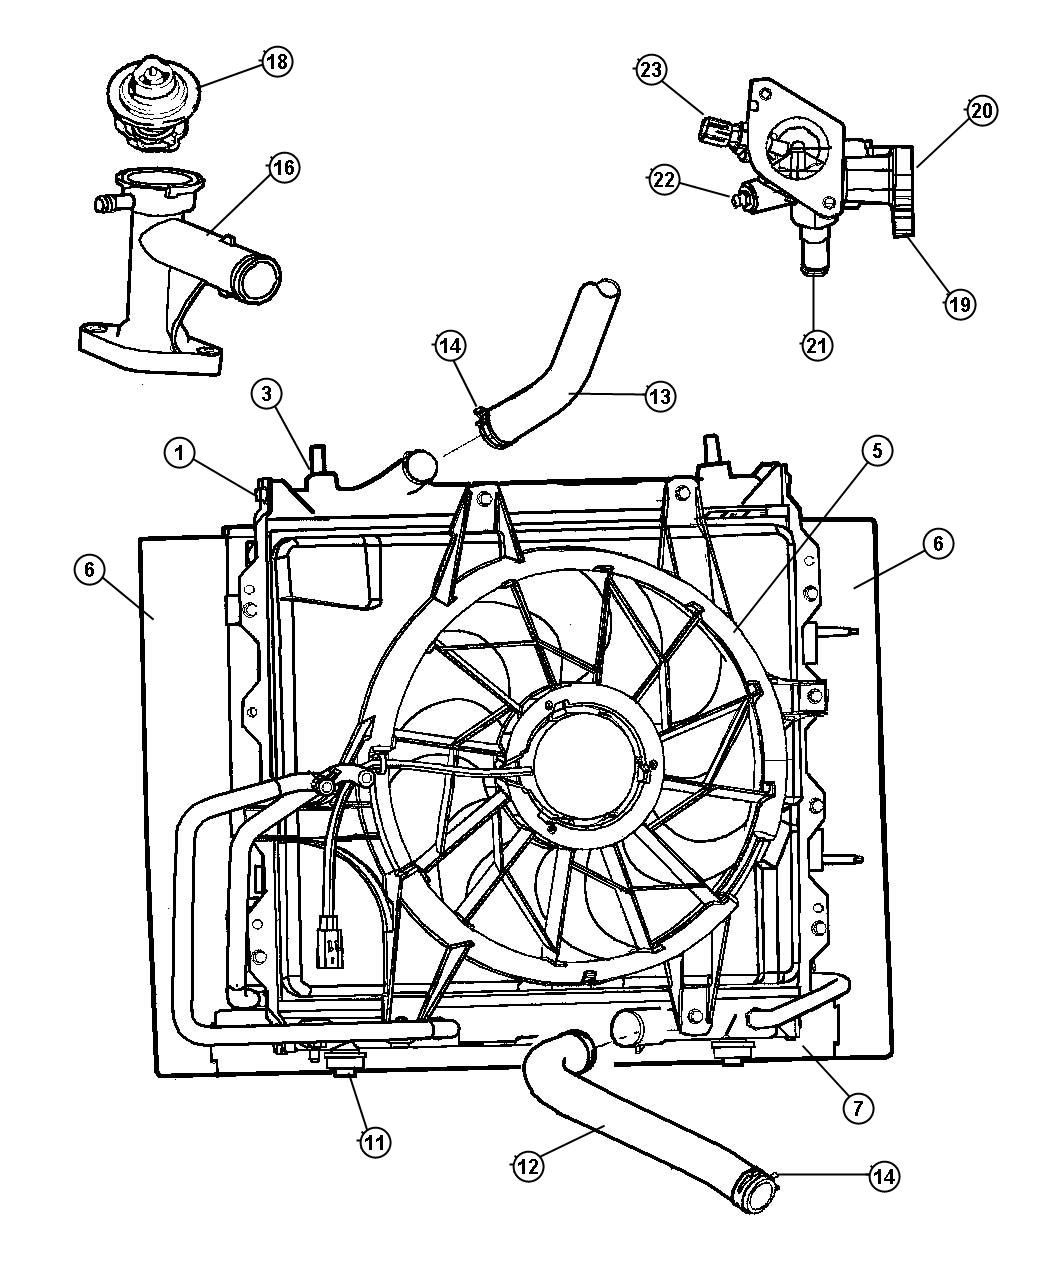 2001 pt cruiser wiring diagram ford taurus cooling system international pro star headlight